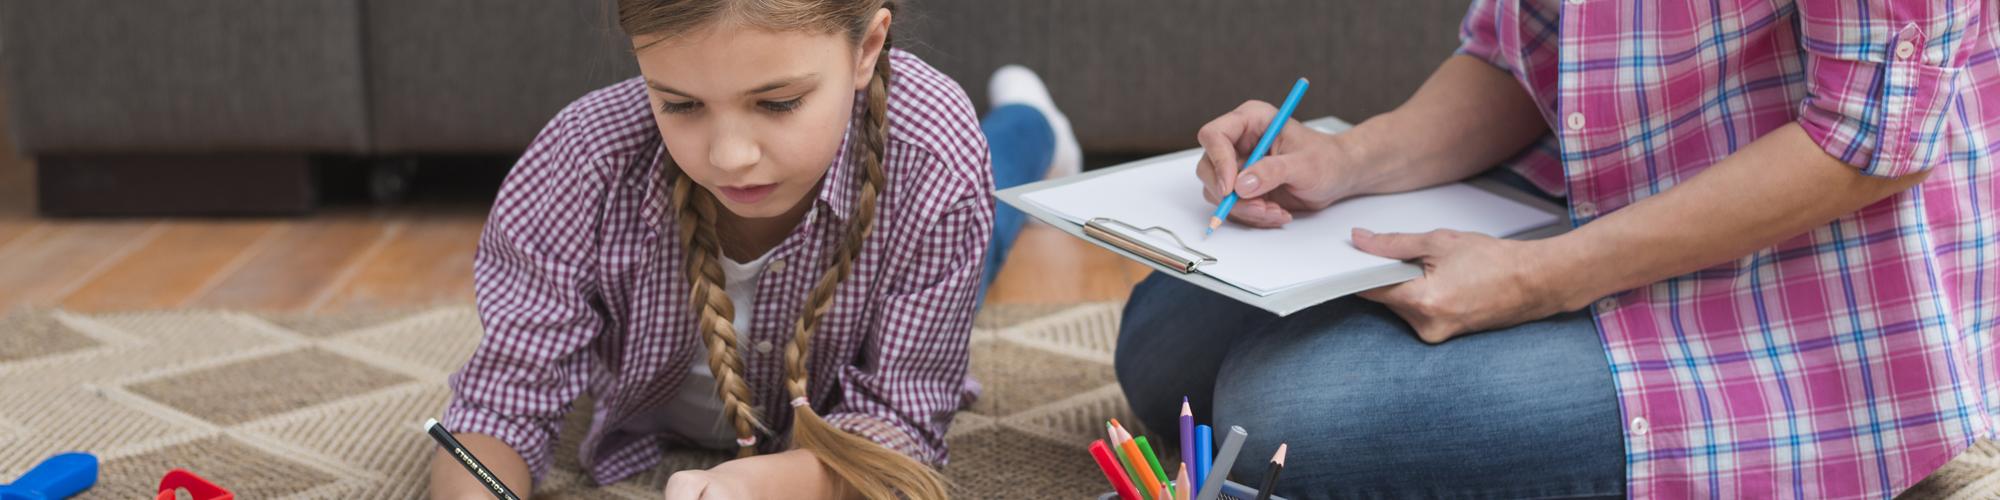 ¿QUÉ DIFICULTADES ATIENDE UNA PSICÓLOGA INFANTIL?